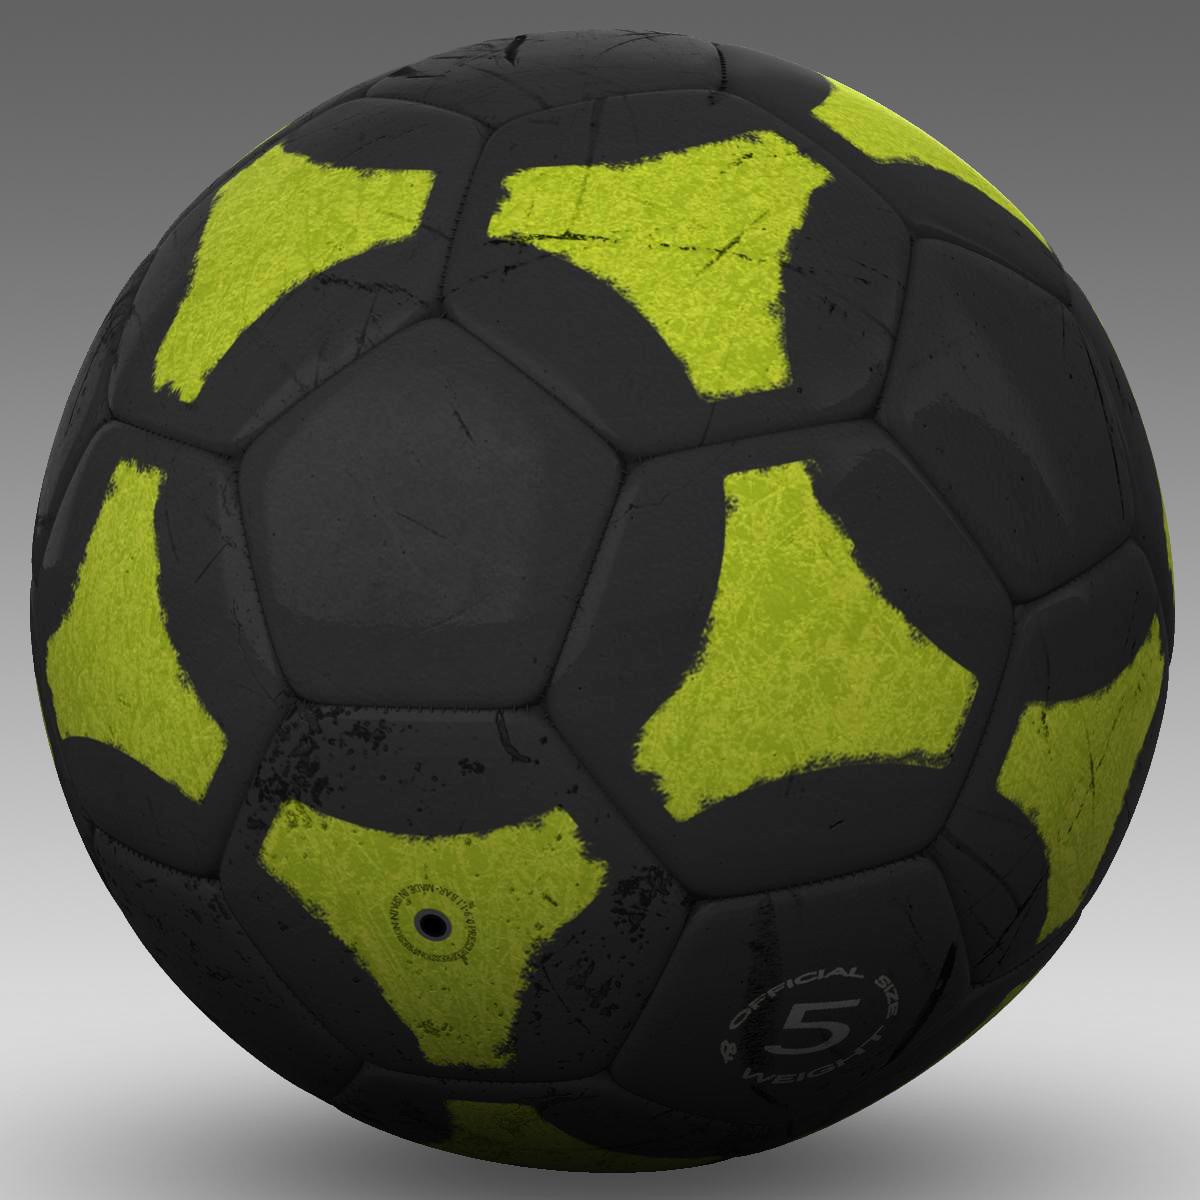 soccerball black yellow 3d model 3ds max fbx c4d ma mb obj 204211